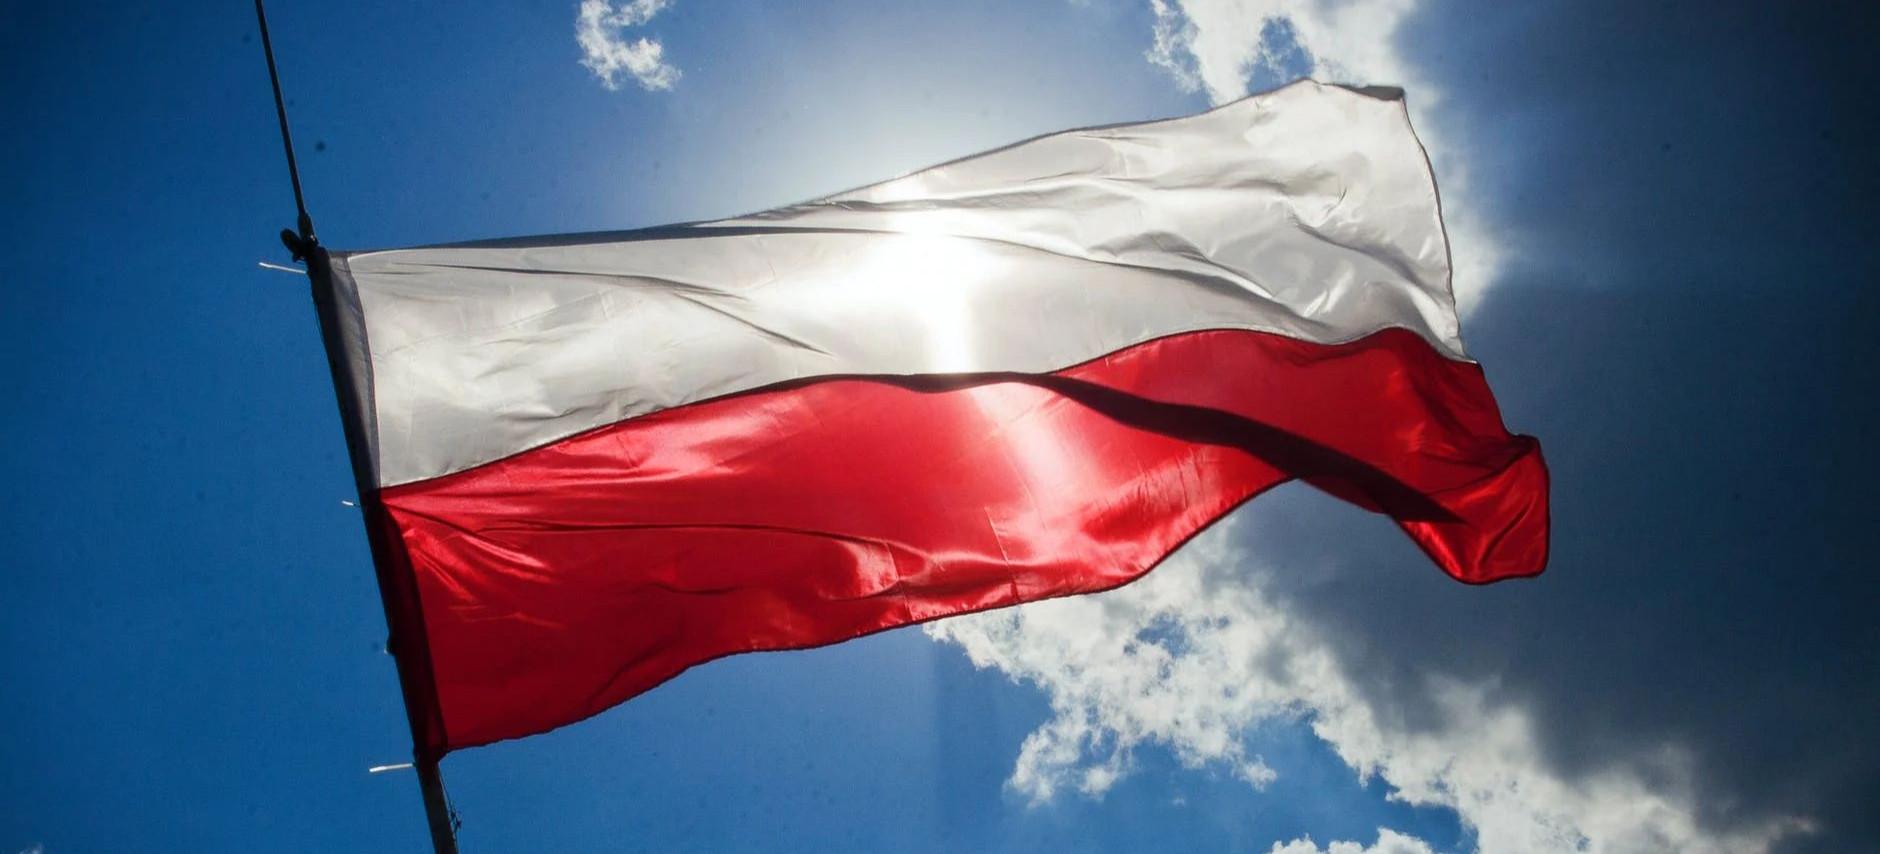 Akcja #MojaFlaga. Celebrujmy Dzień Flagi RP! (VIDEO)